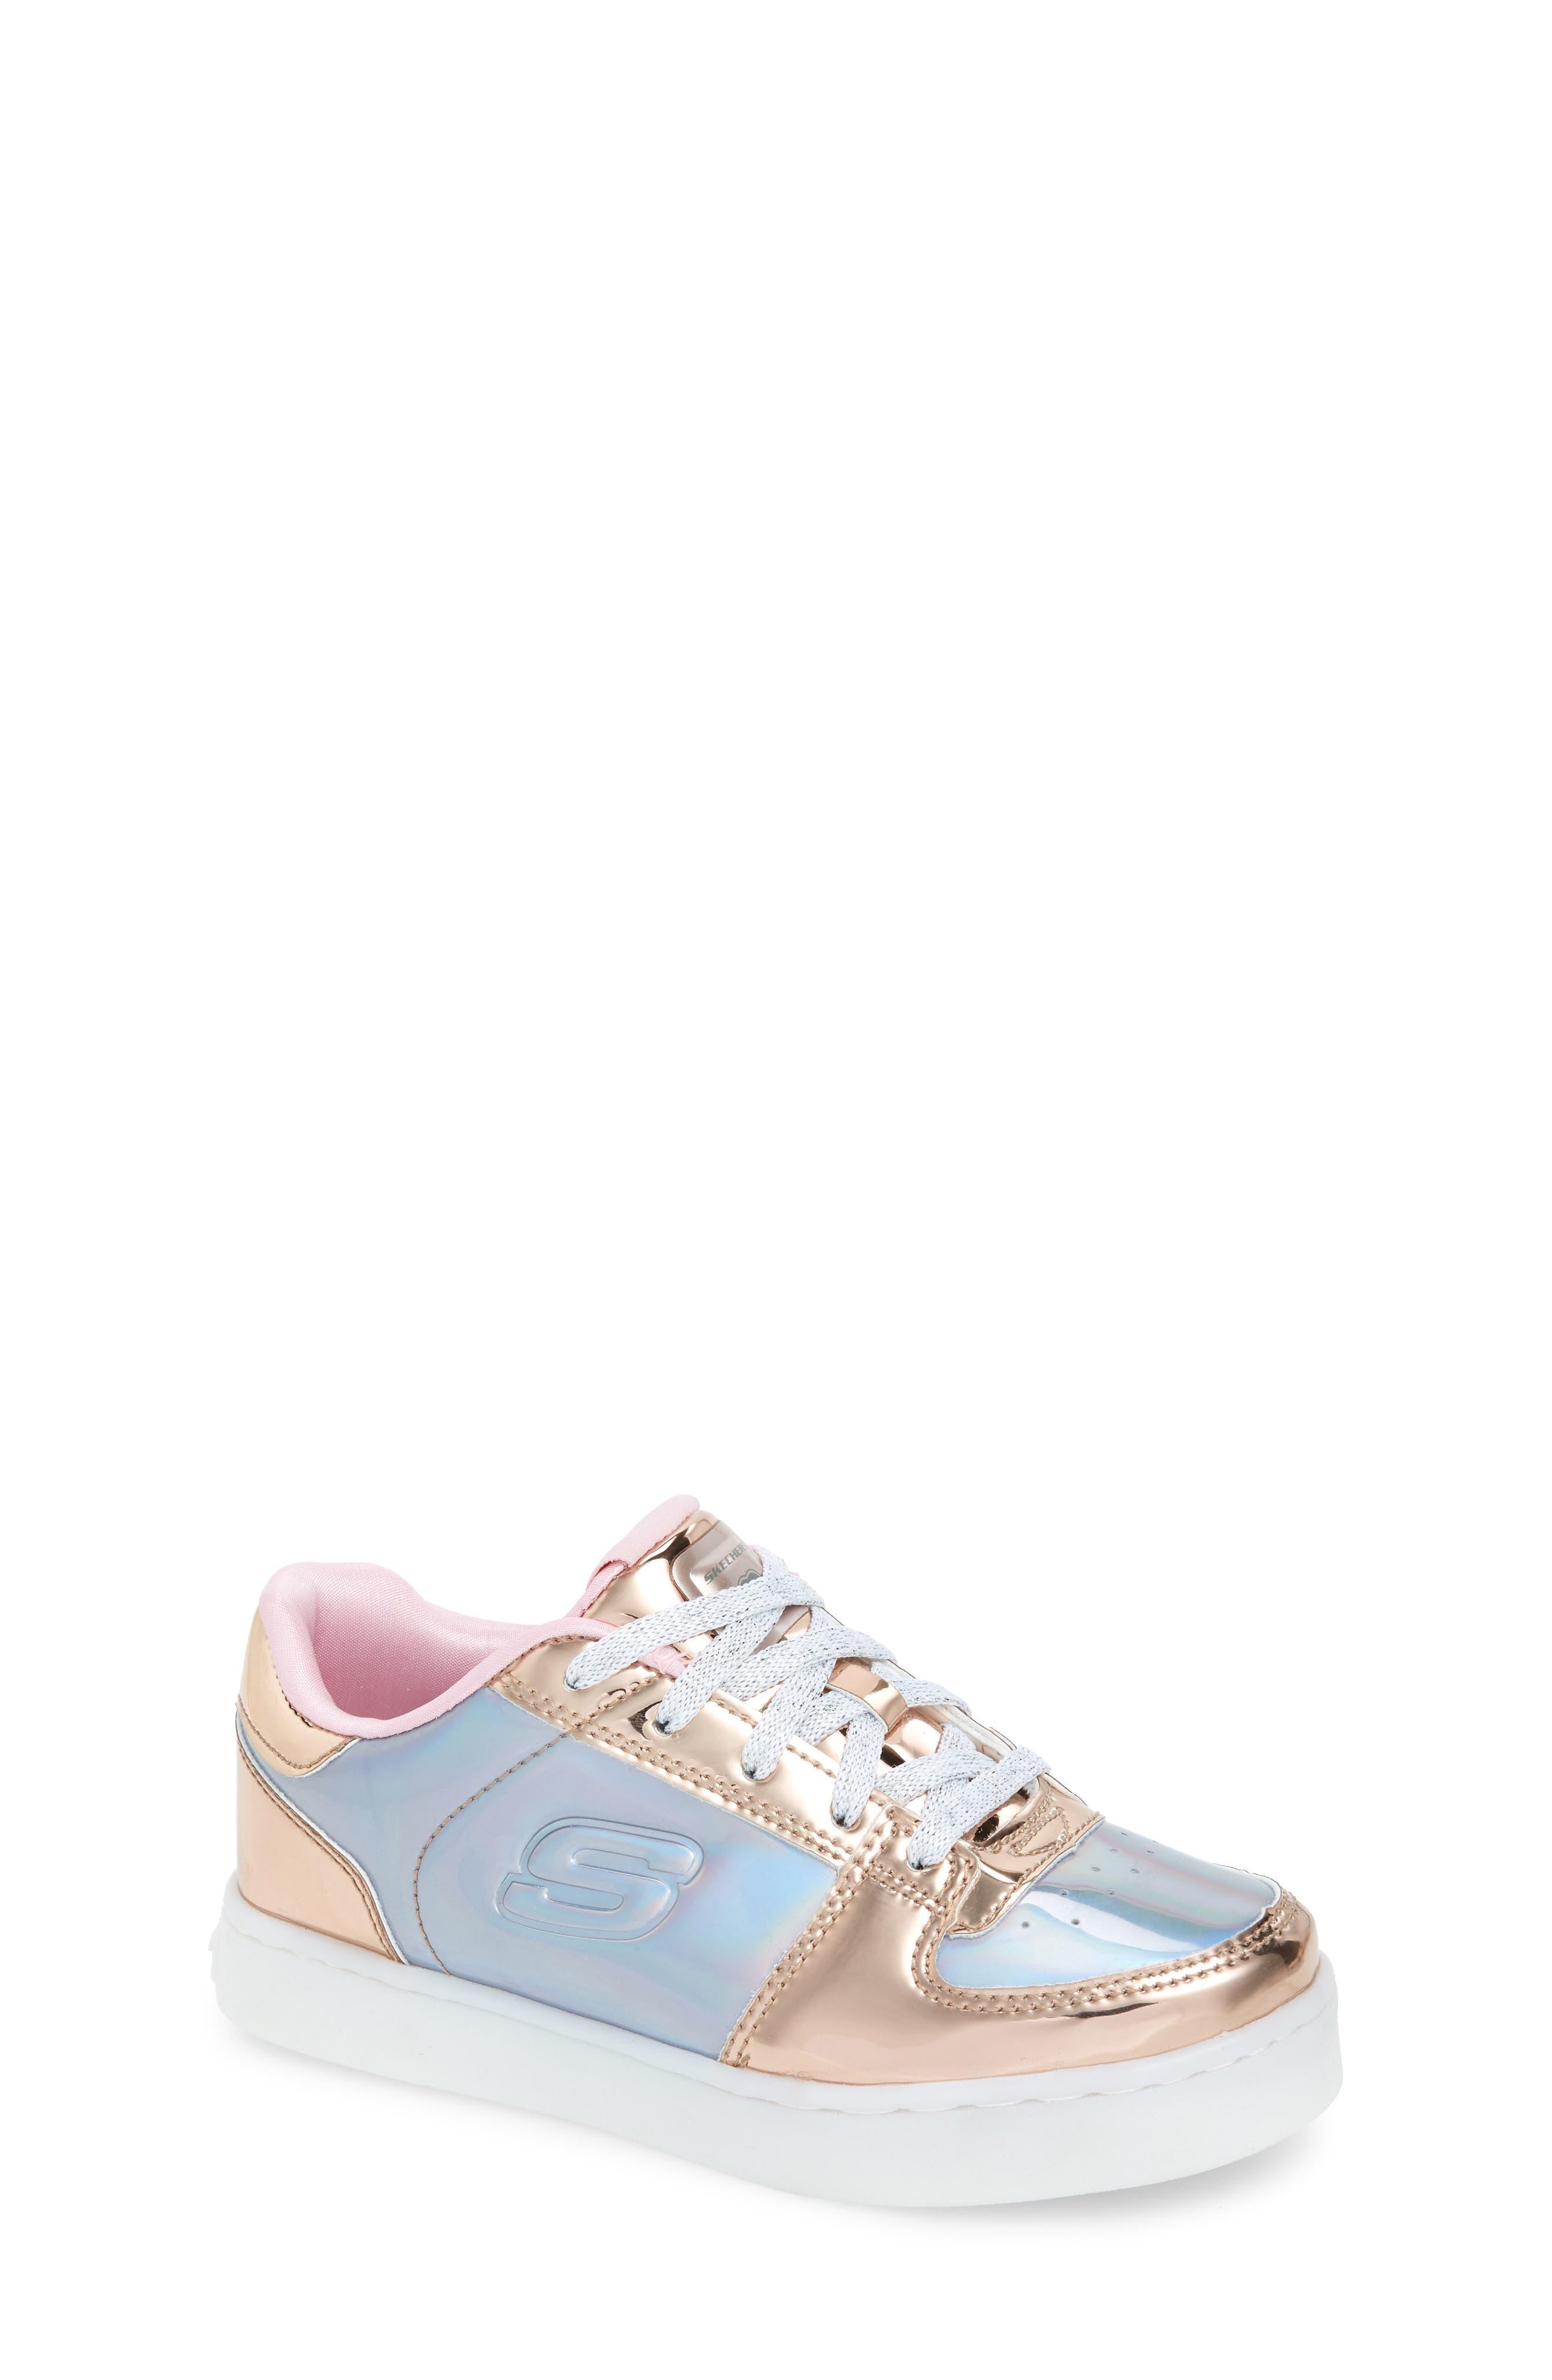 SKECHERS Energy Lights Shiny Light-Up Sneaker, Main, color, 222